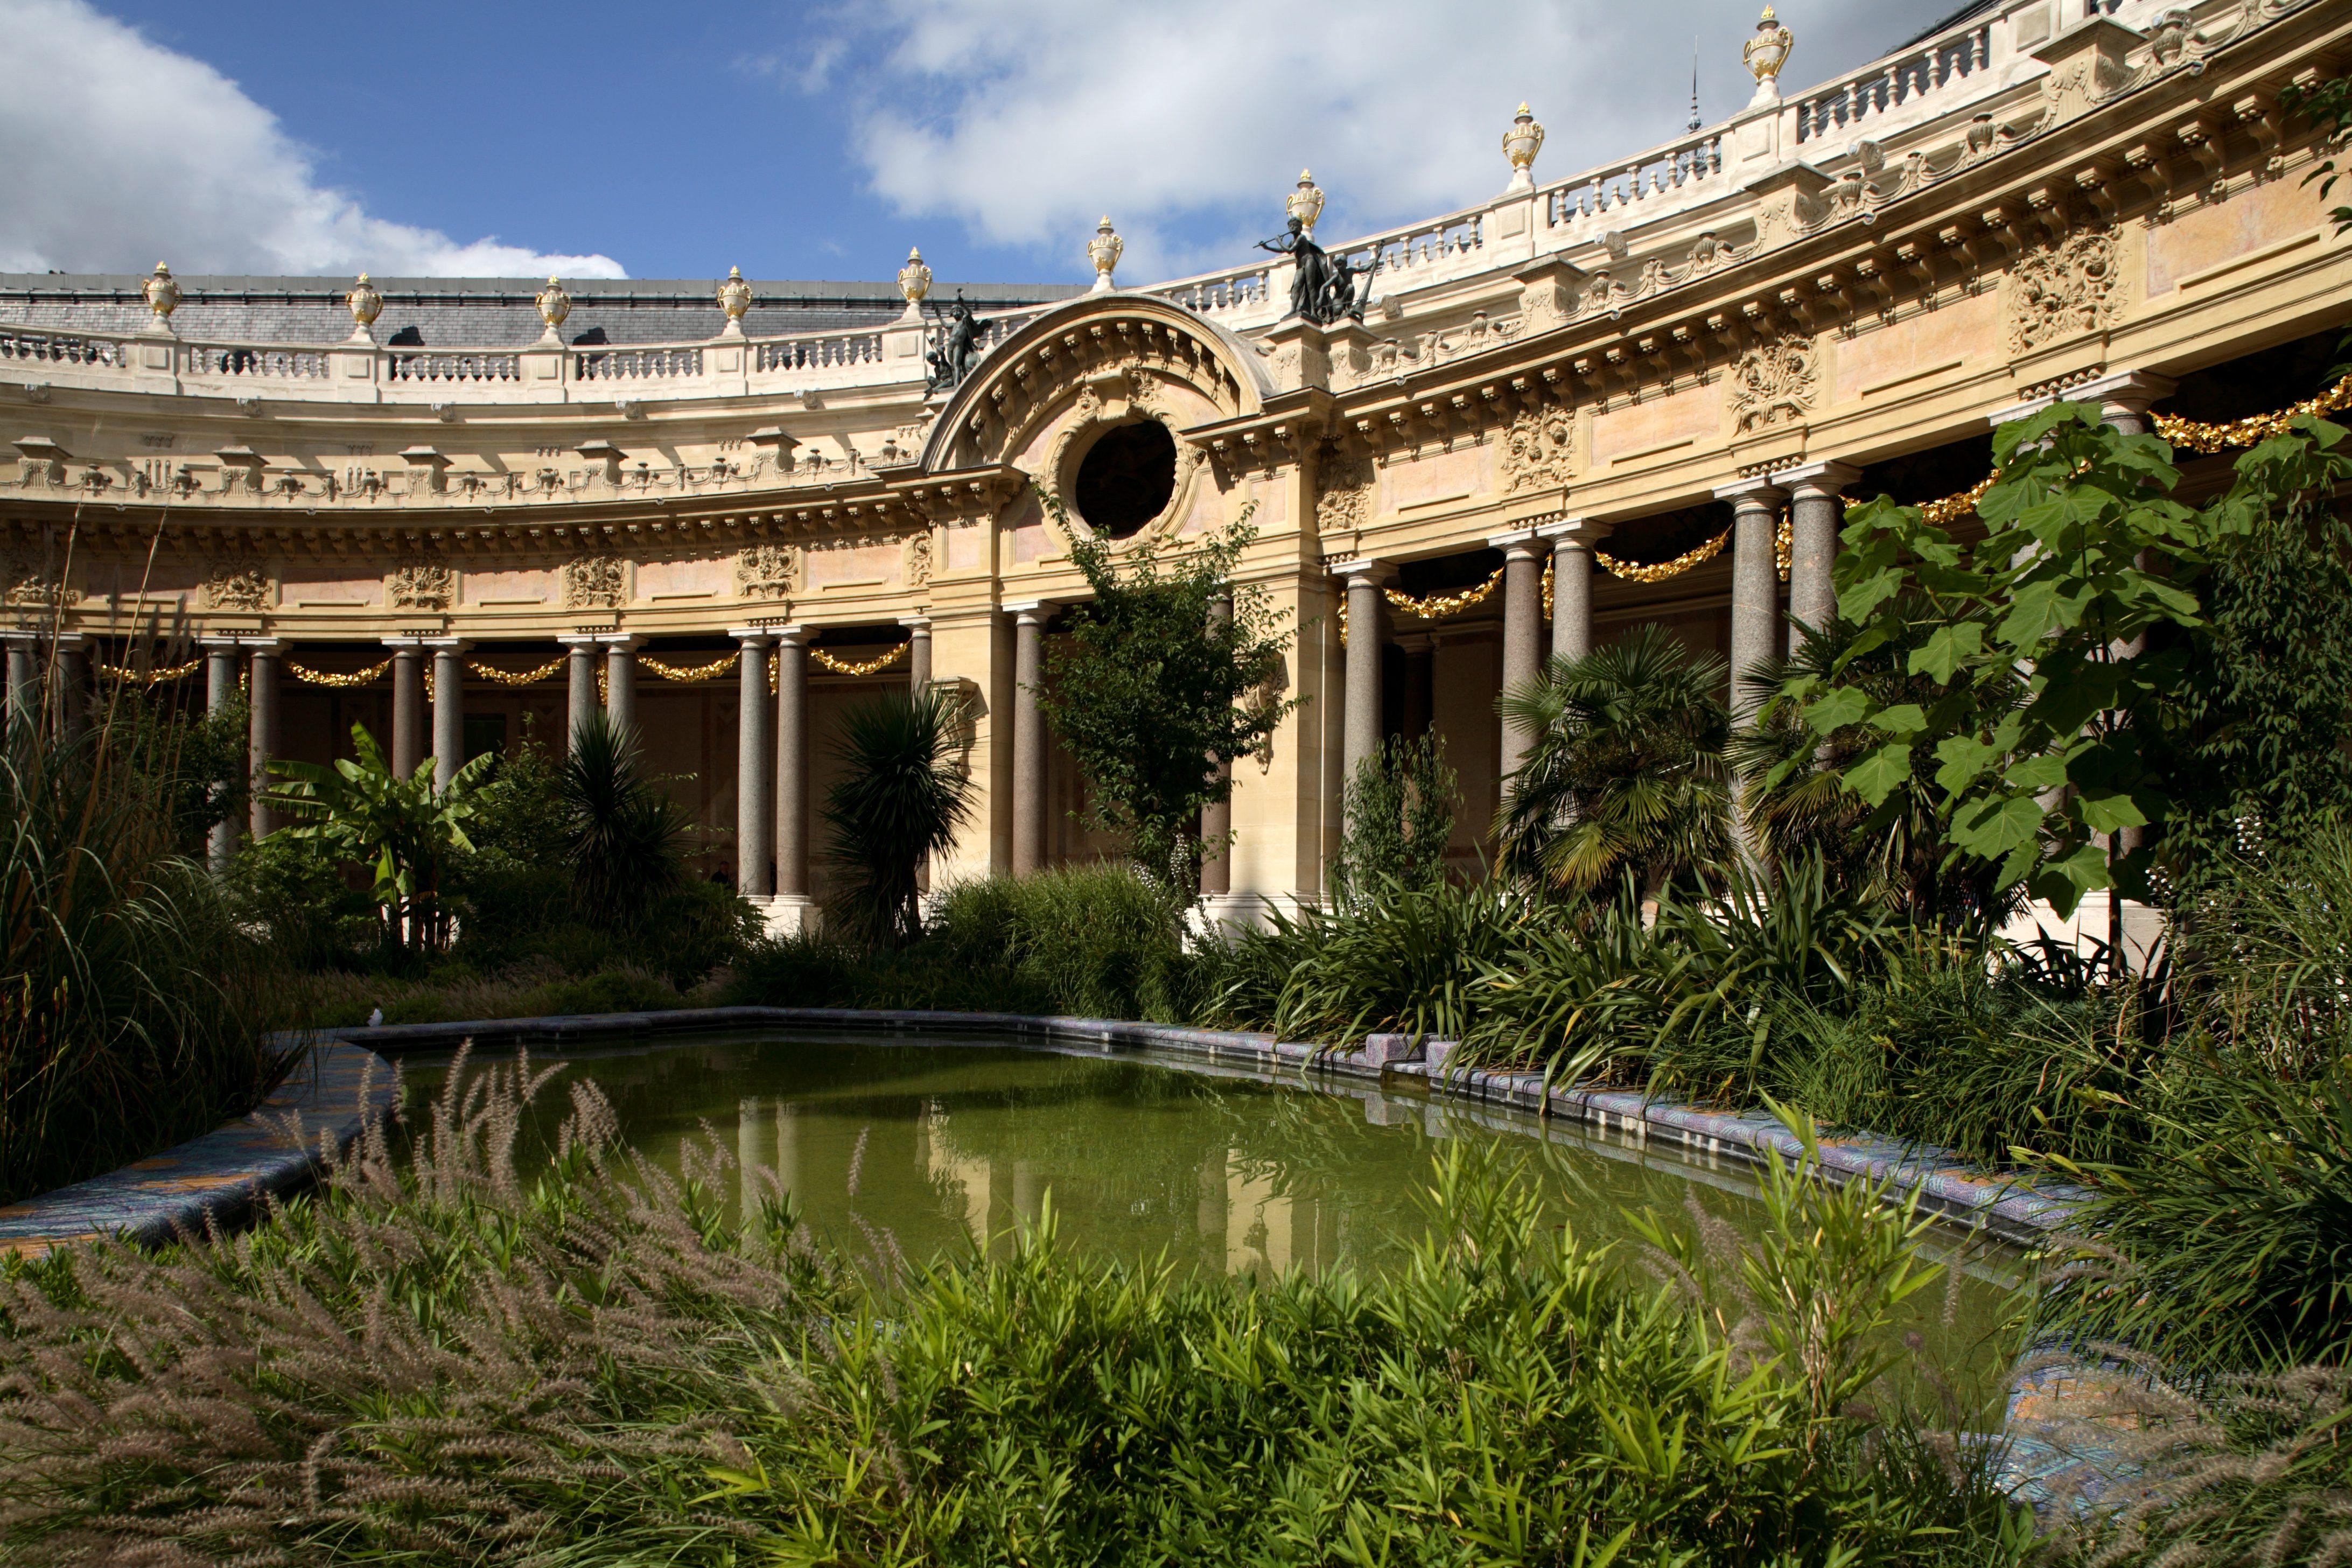 Garden and semi-circular courtyard of Petit Palais, now housing City of Paris Museum of Fine Arts.